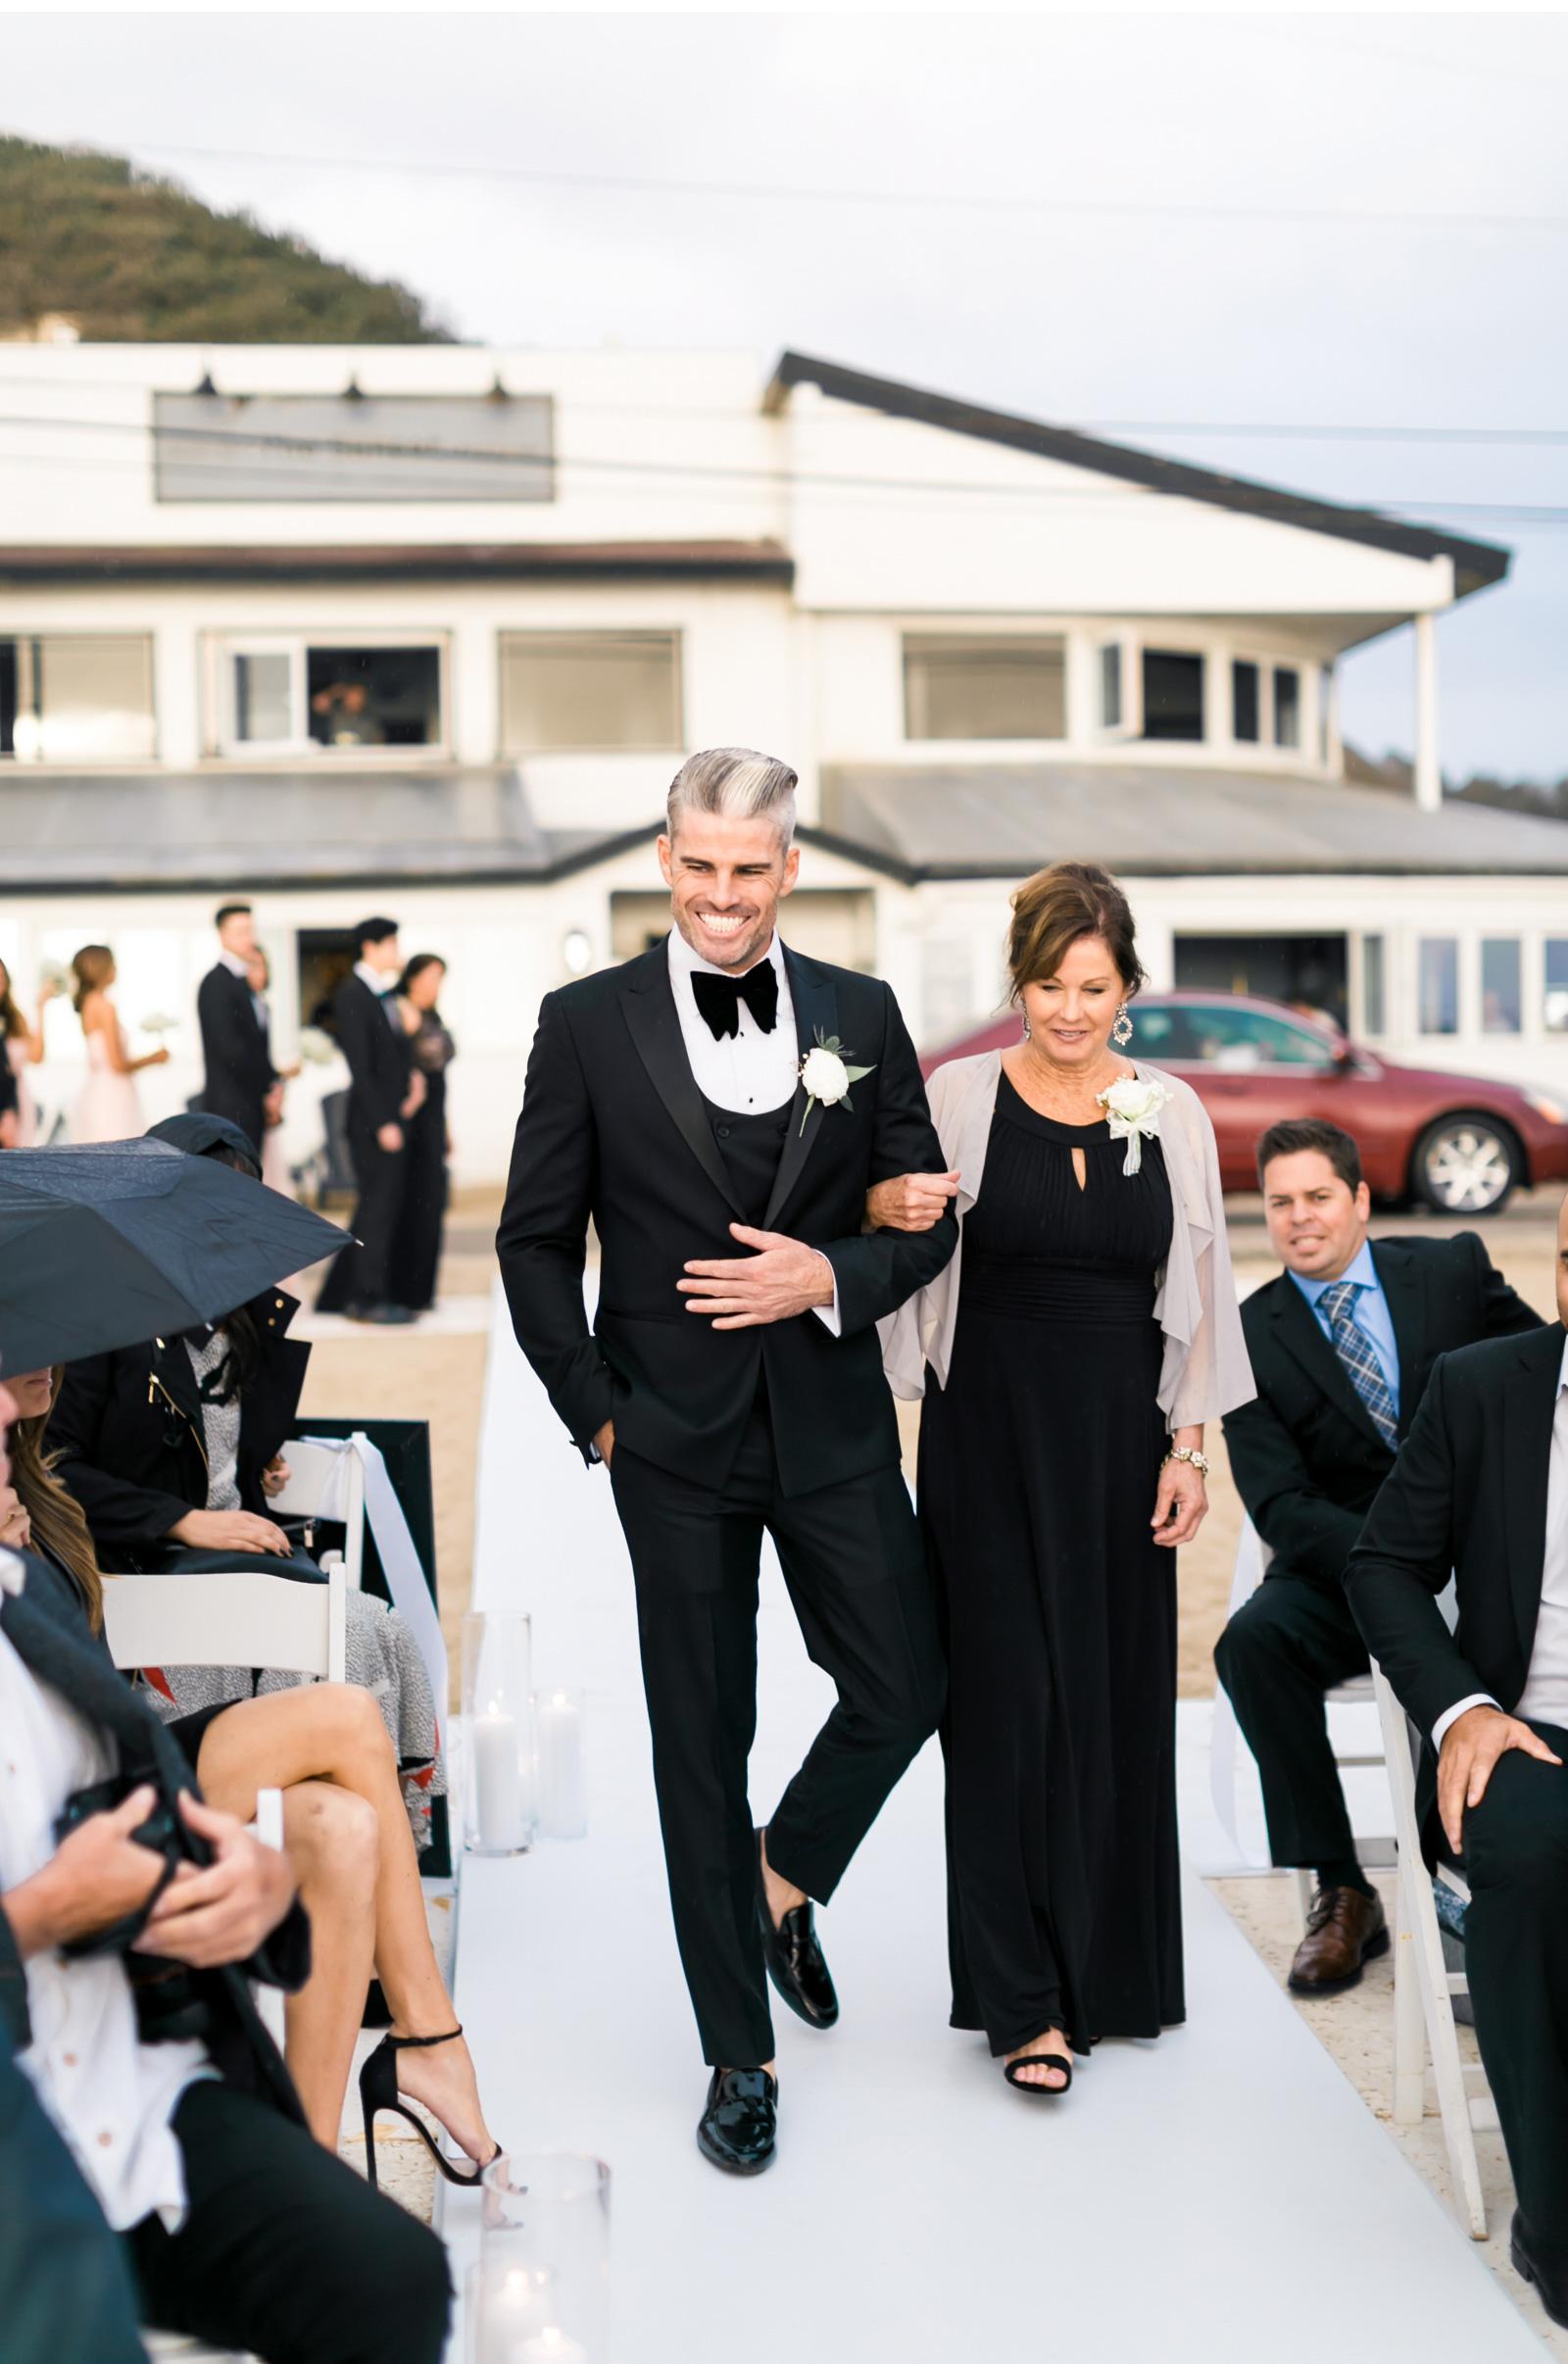 Malibu-Wedding-Natalie-Schutt-Photography-Style-Me-Pretty_01.jpg